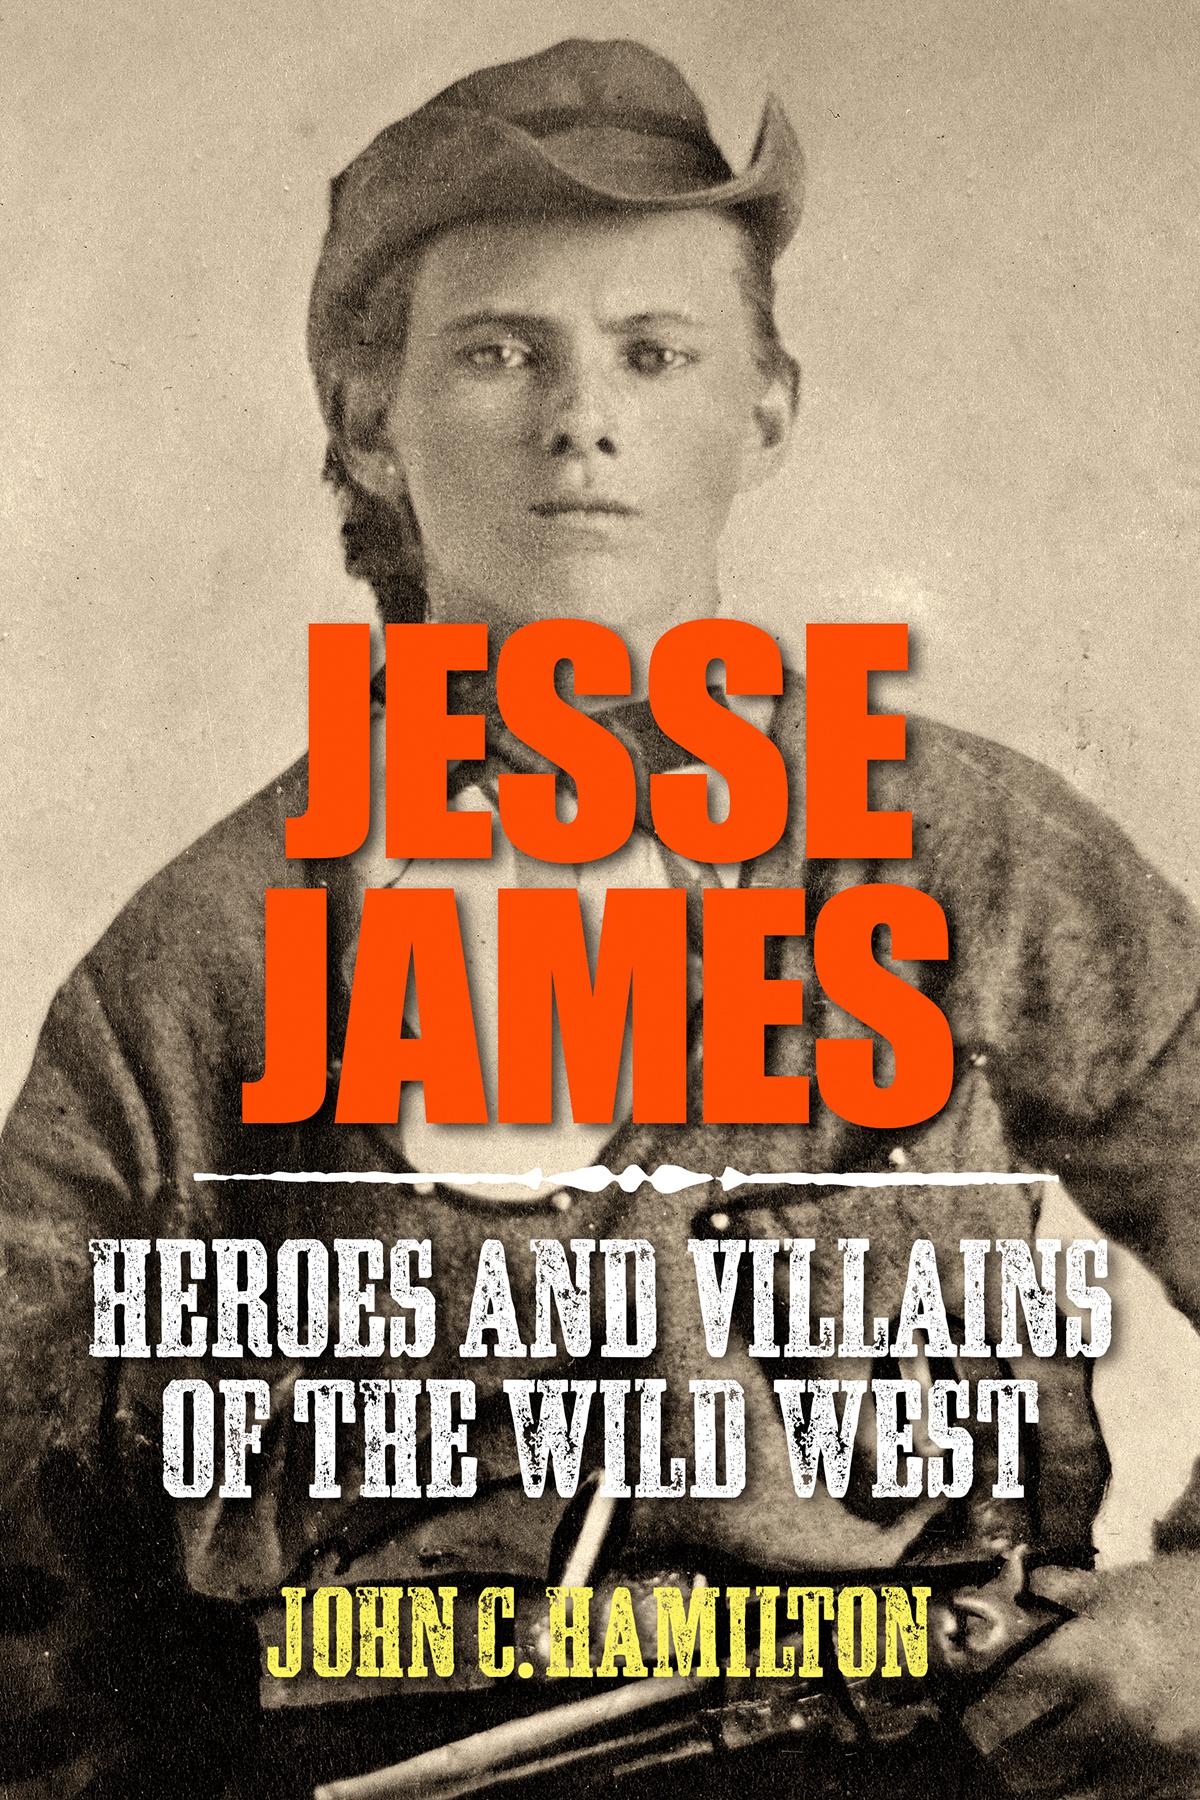 Jesse James cover.jpg